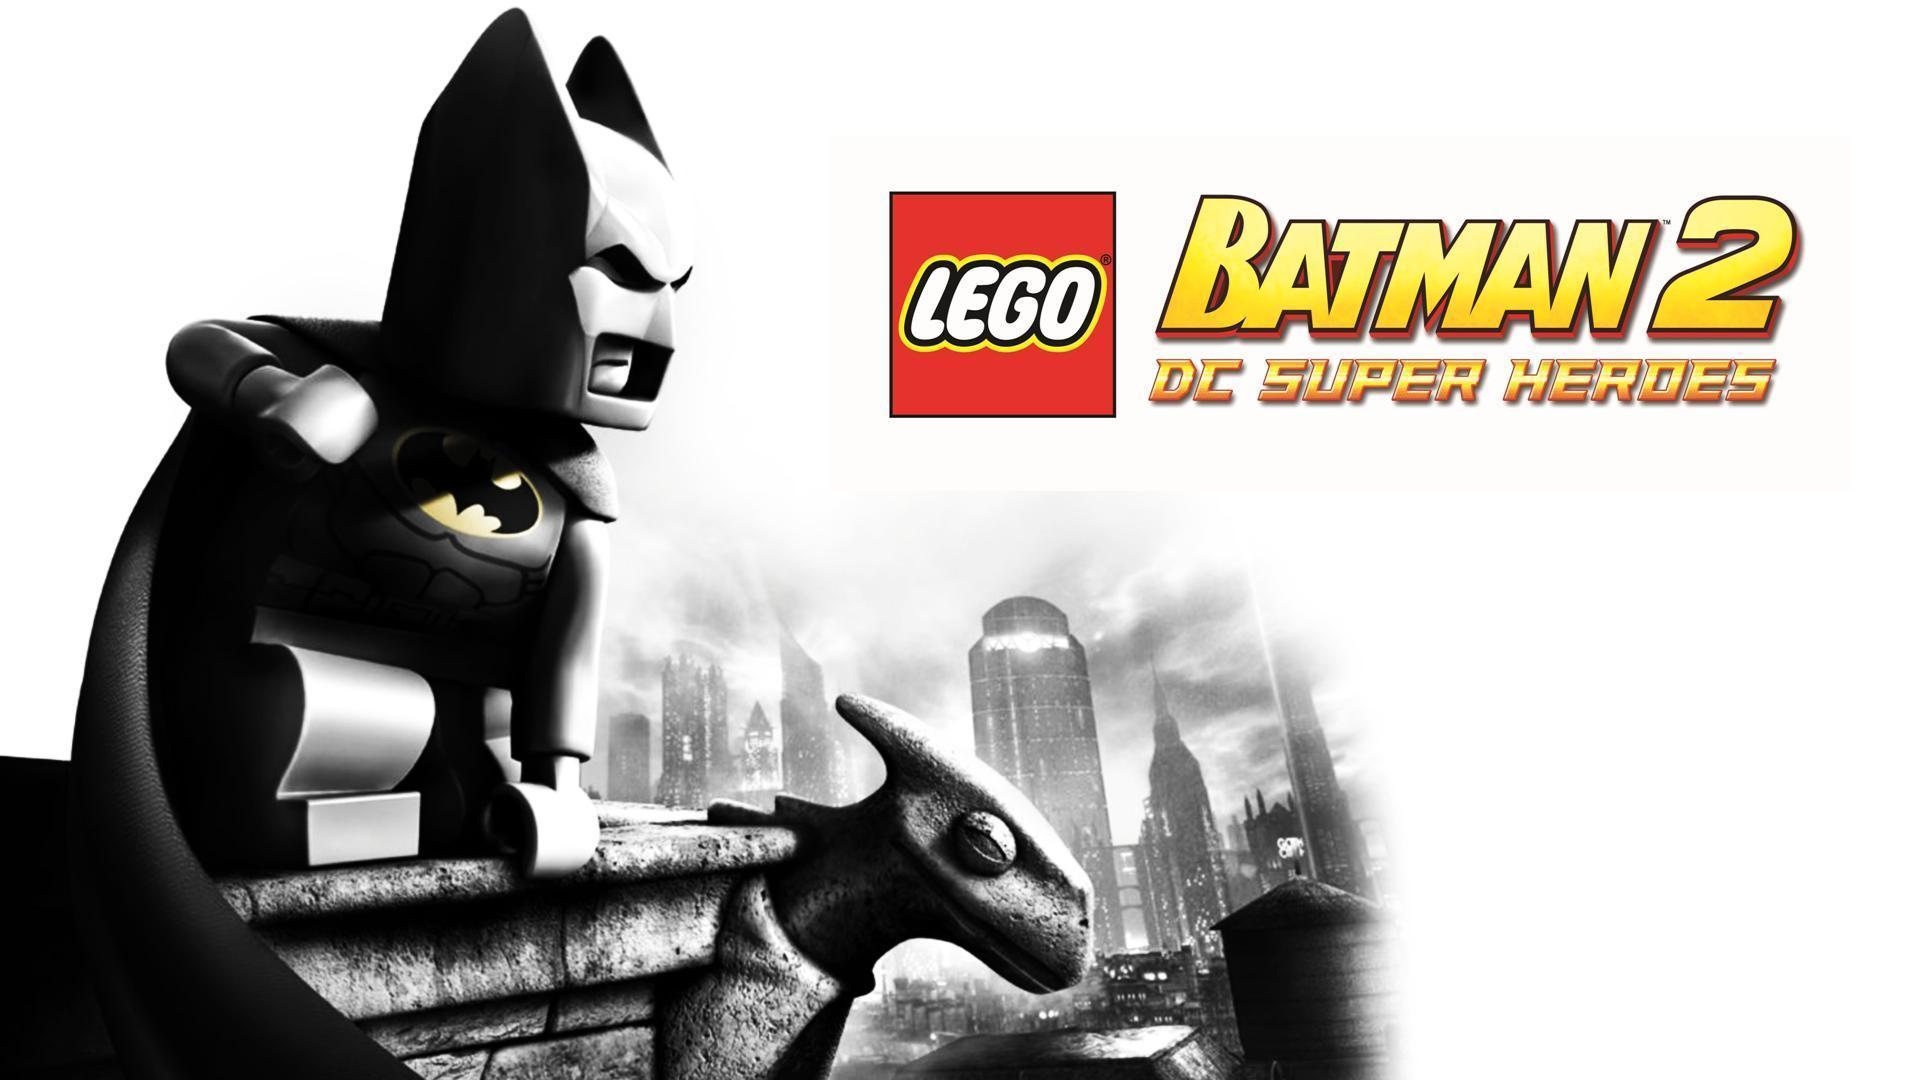 lego batman 2 wallpaper flash - photo #33